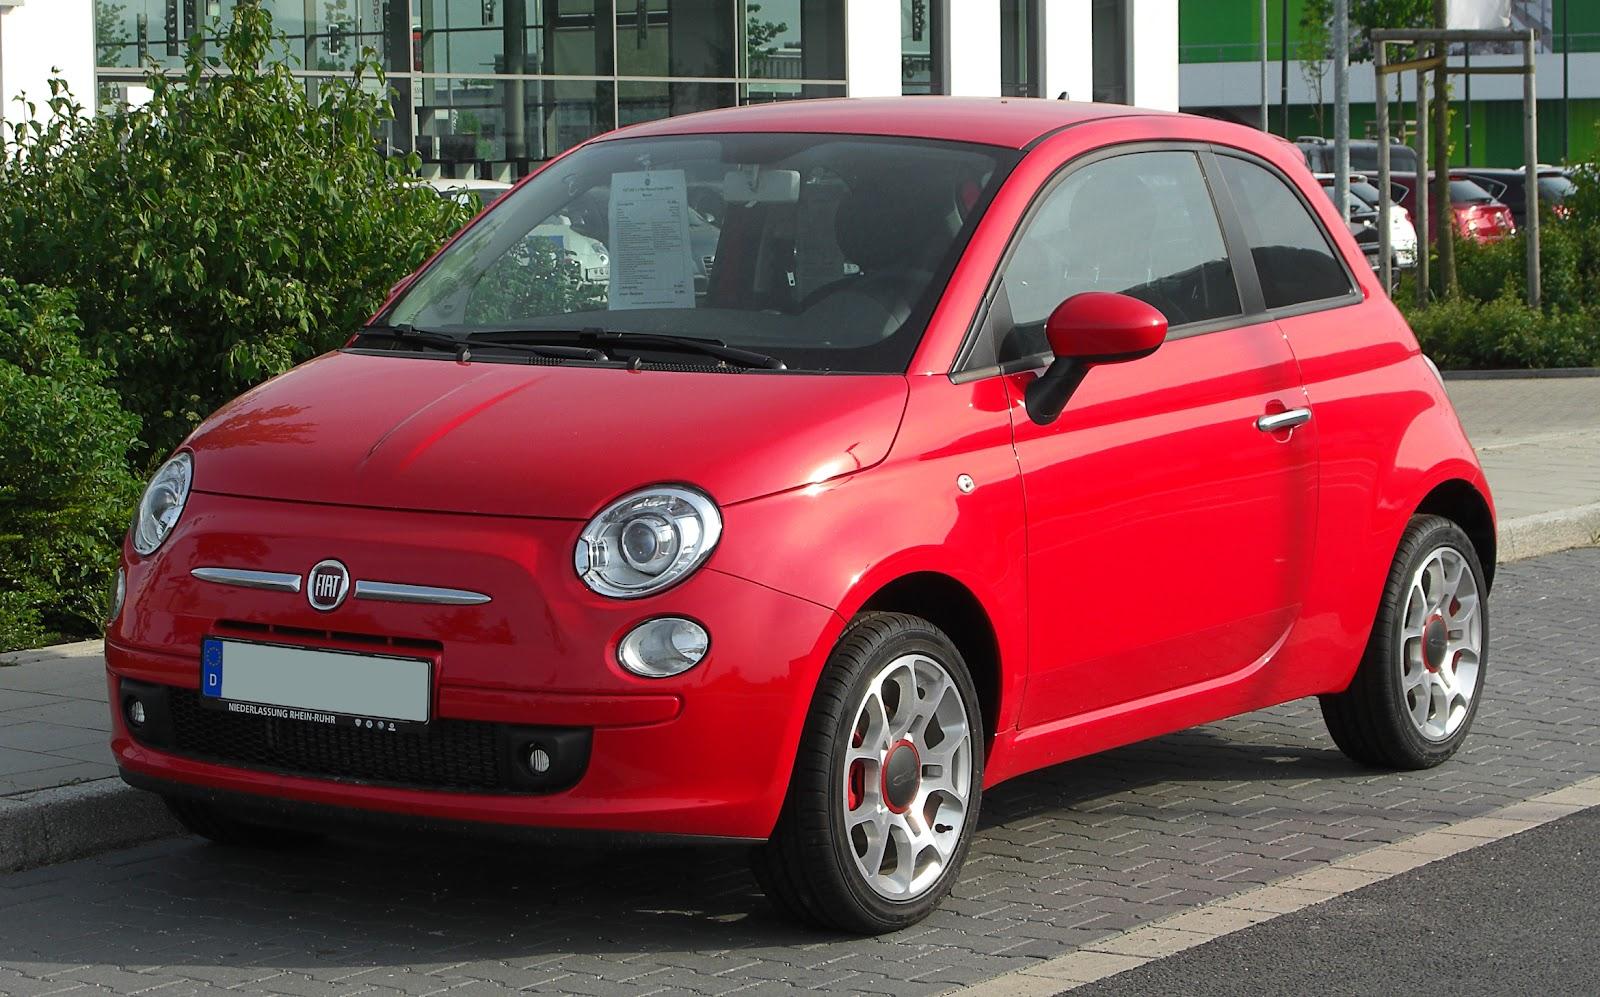 Fiat_500_1.4_16V_Rosso_Corsa_–_Frontansicht,_7._Mai_2011,_Düsseldorf.jpg